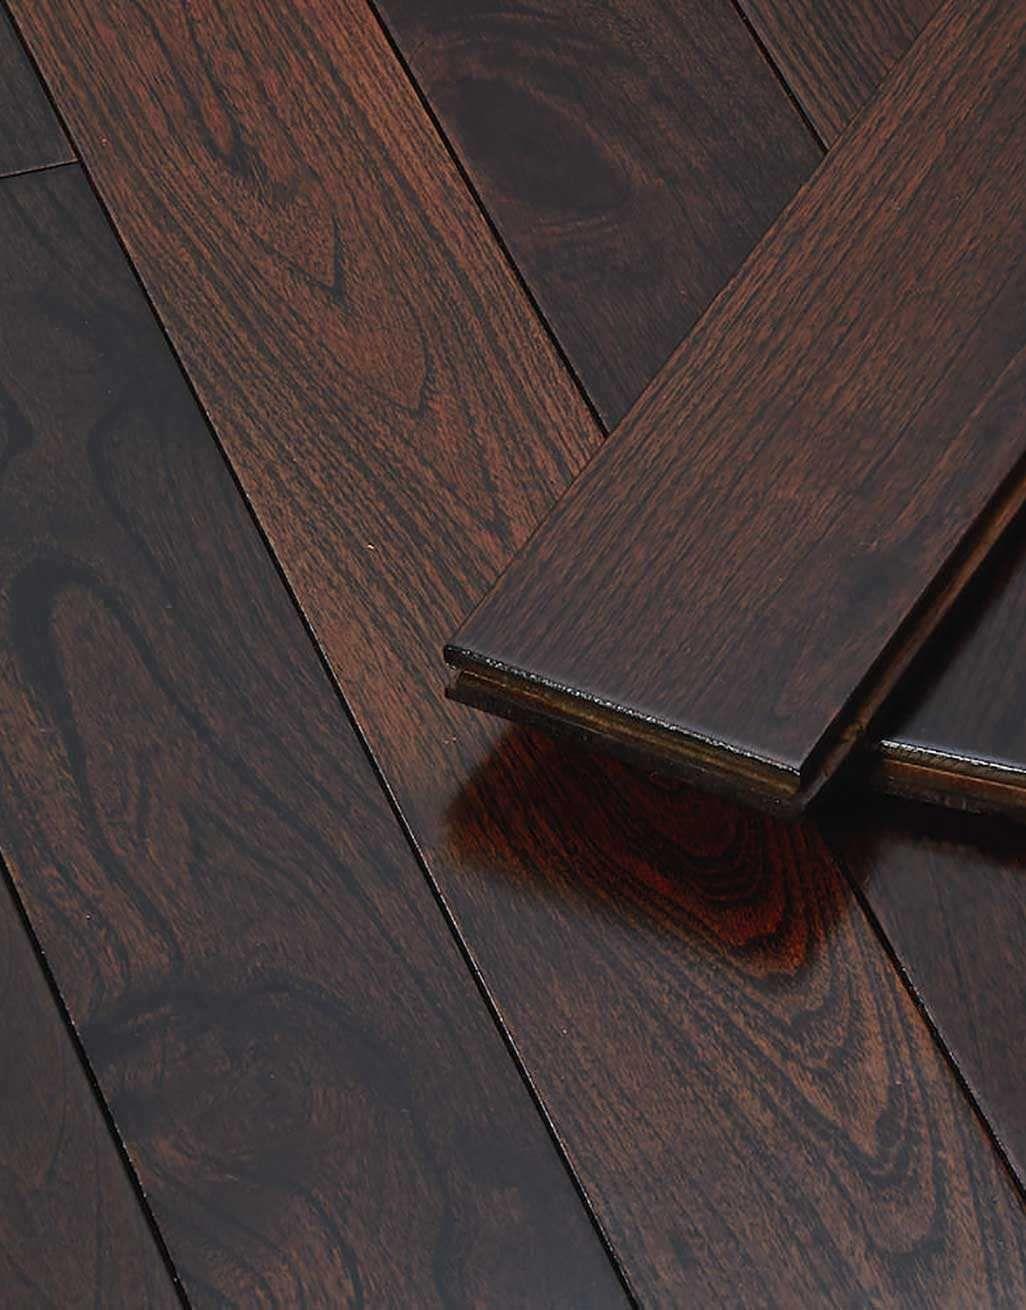 Imperial Teak Lacquered Solid Wood, Imperial Teak Laminate Flooring